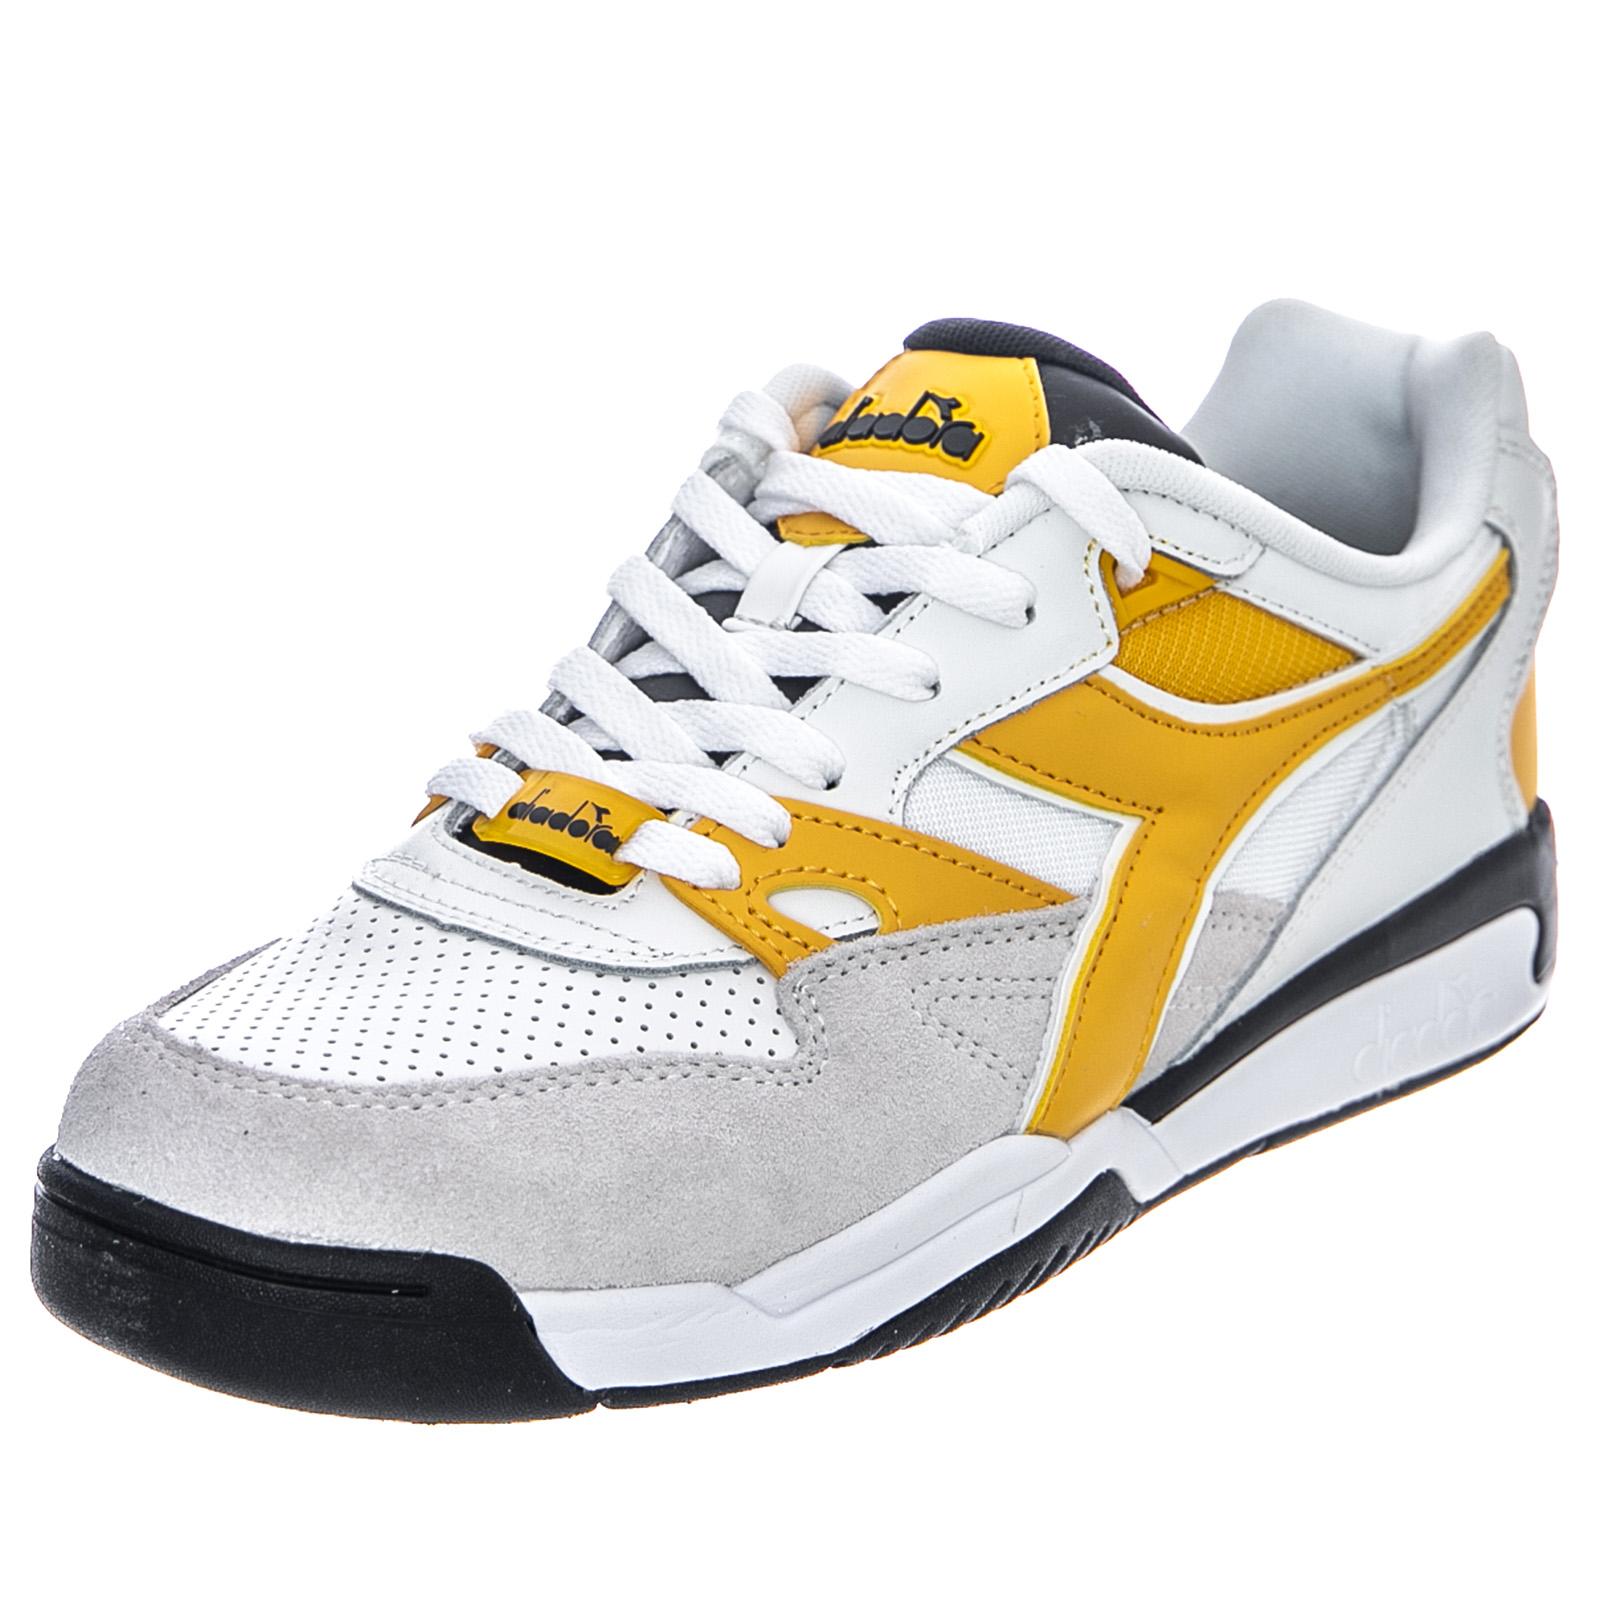 Beta About Rebound Blackwhitebanana Low Diadora Ace Sneakers Details Black Man ARj534Lq